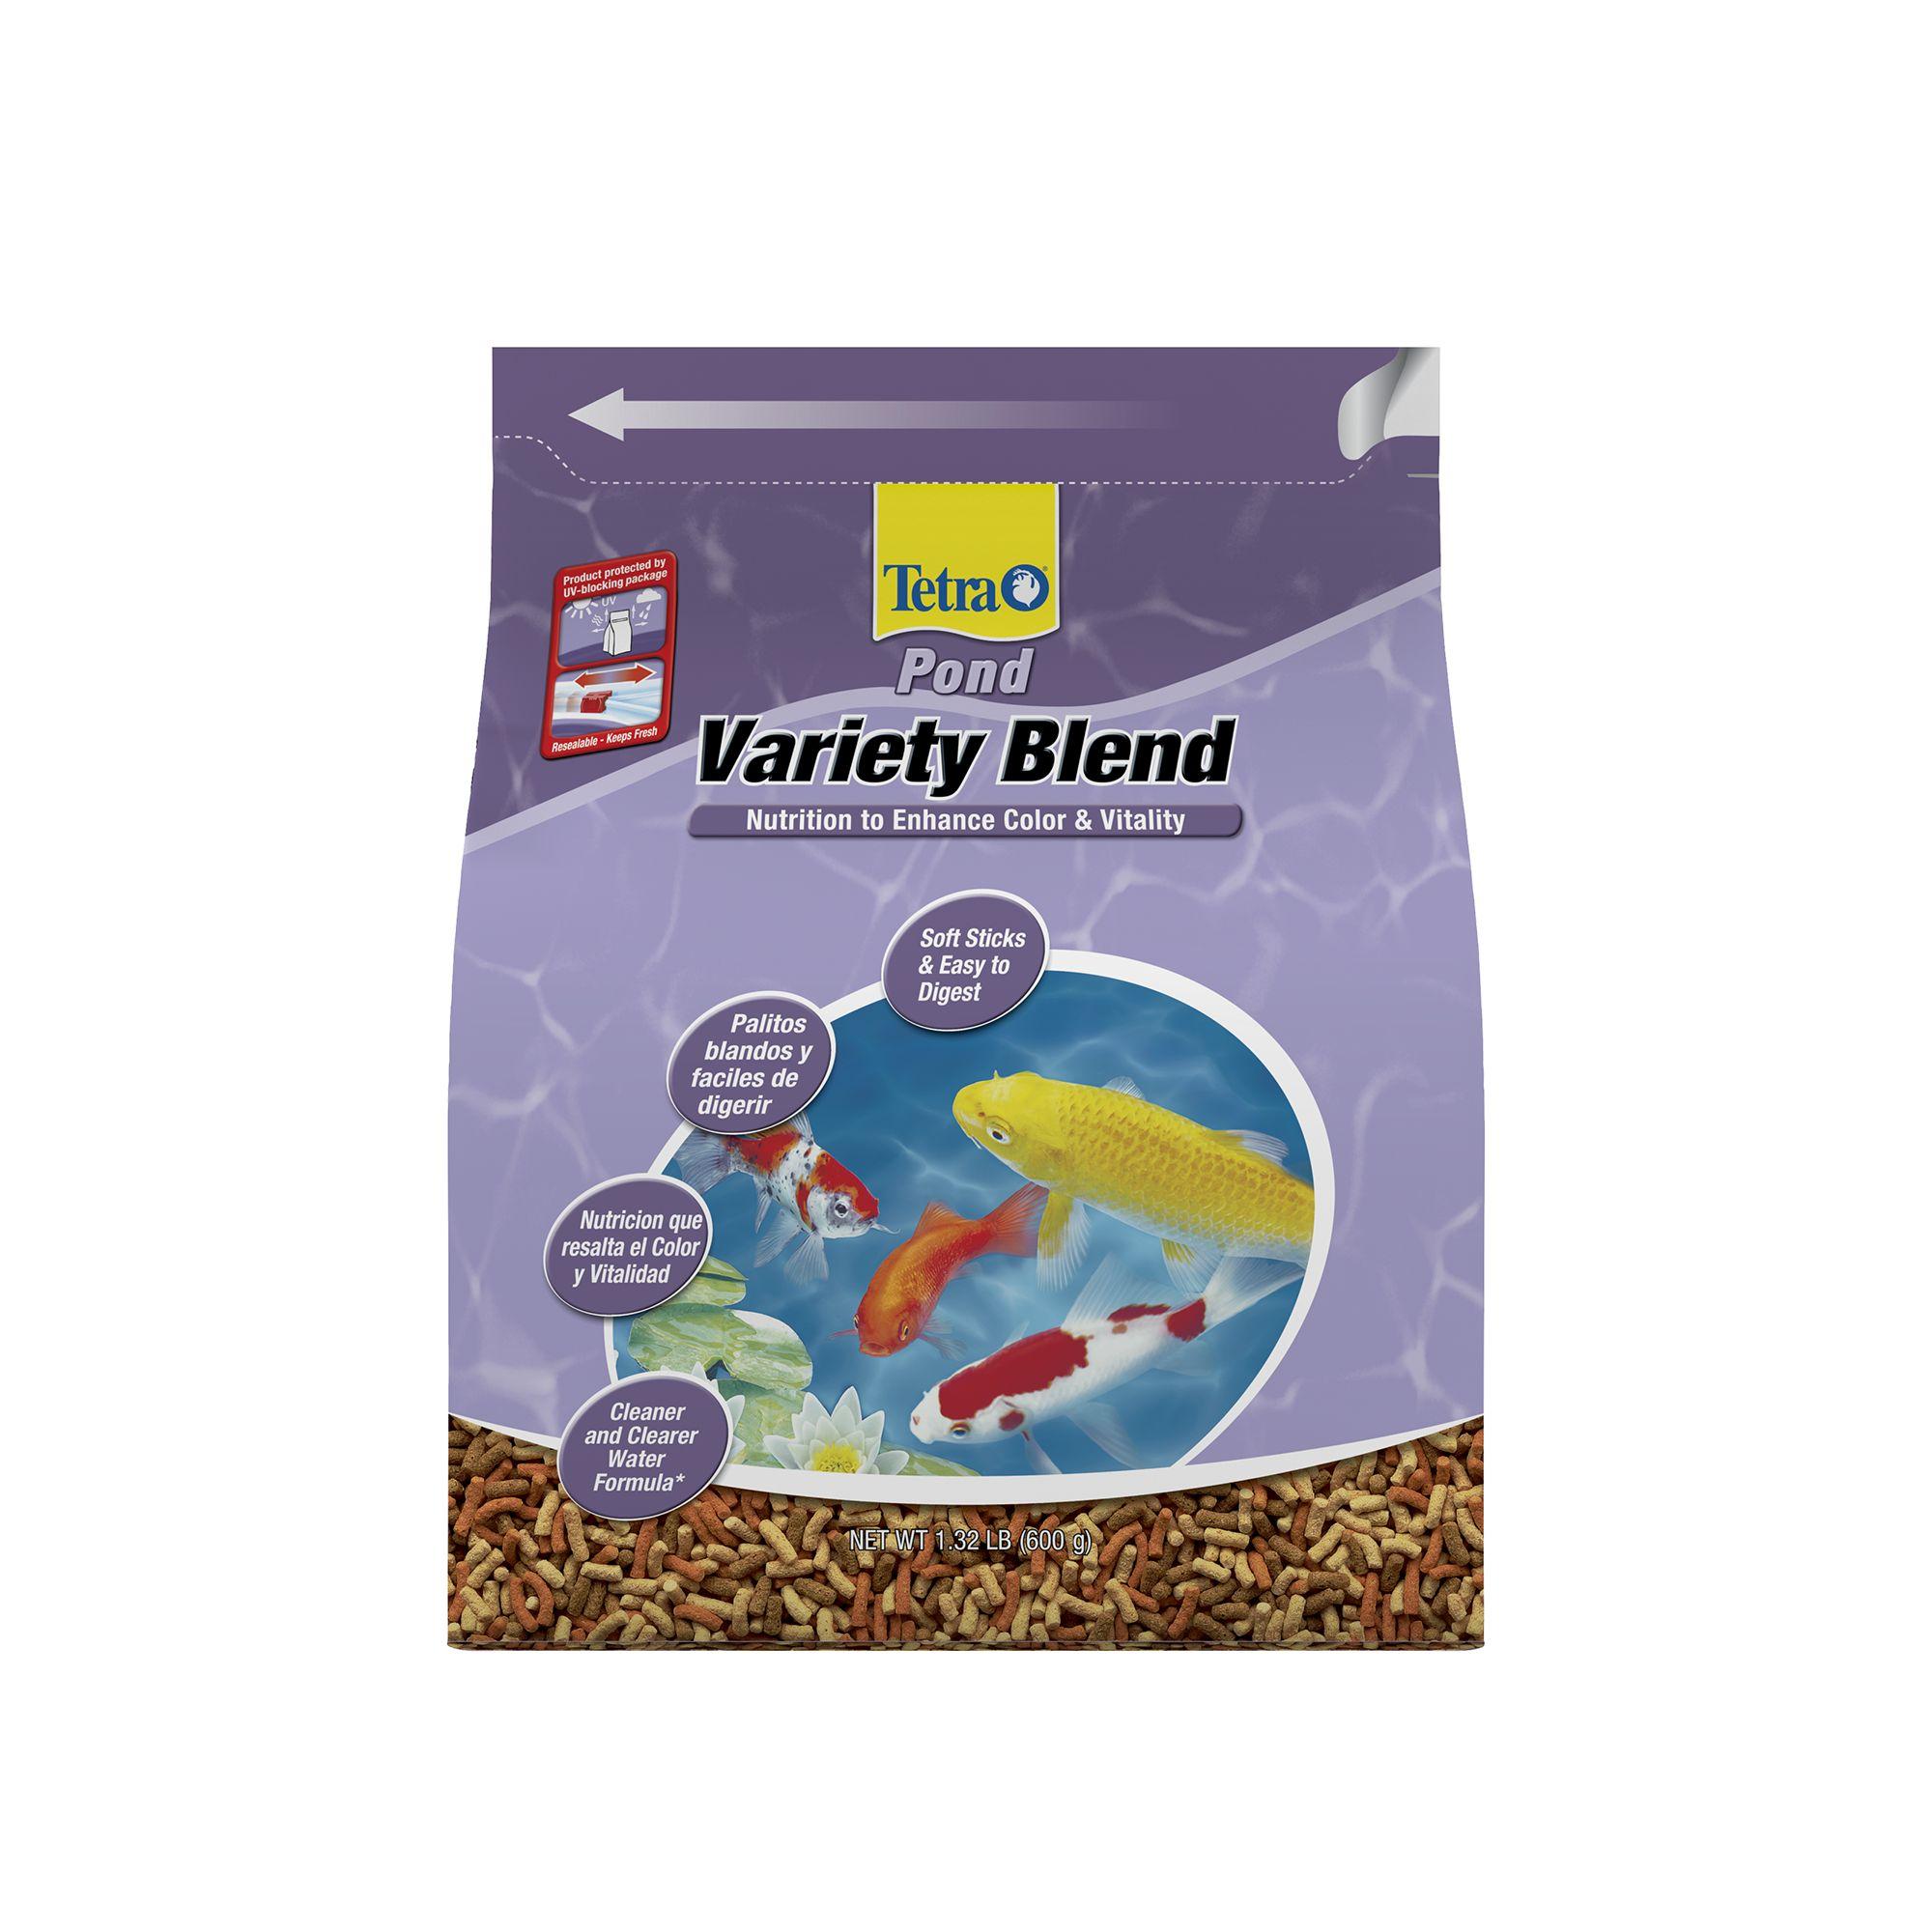 Tetra TetraPond Variety Blend Fish Food size: 1.32 Lb 1031634